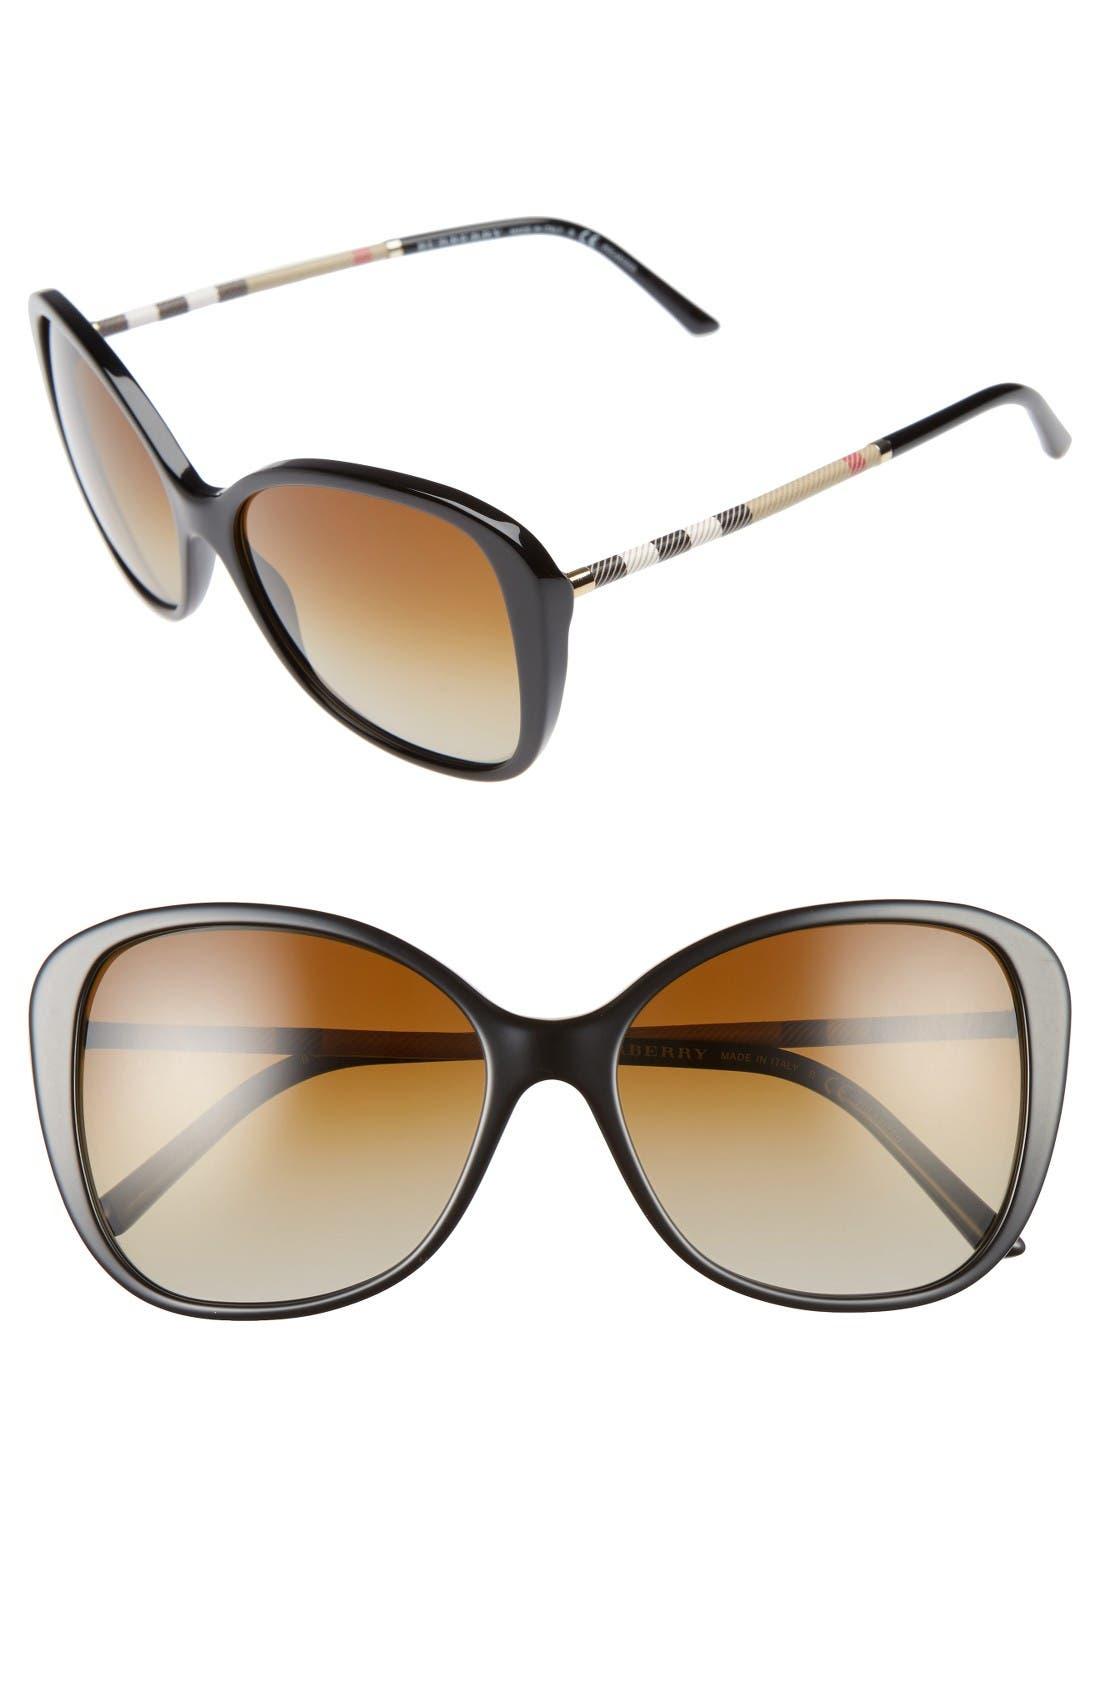 Main Image - Burberry 57mm Polarized Sunglasses